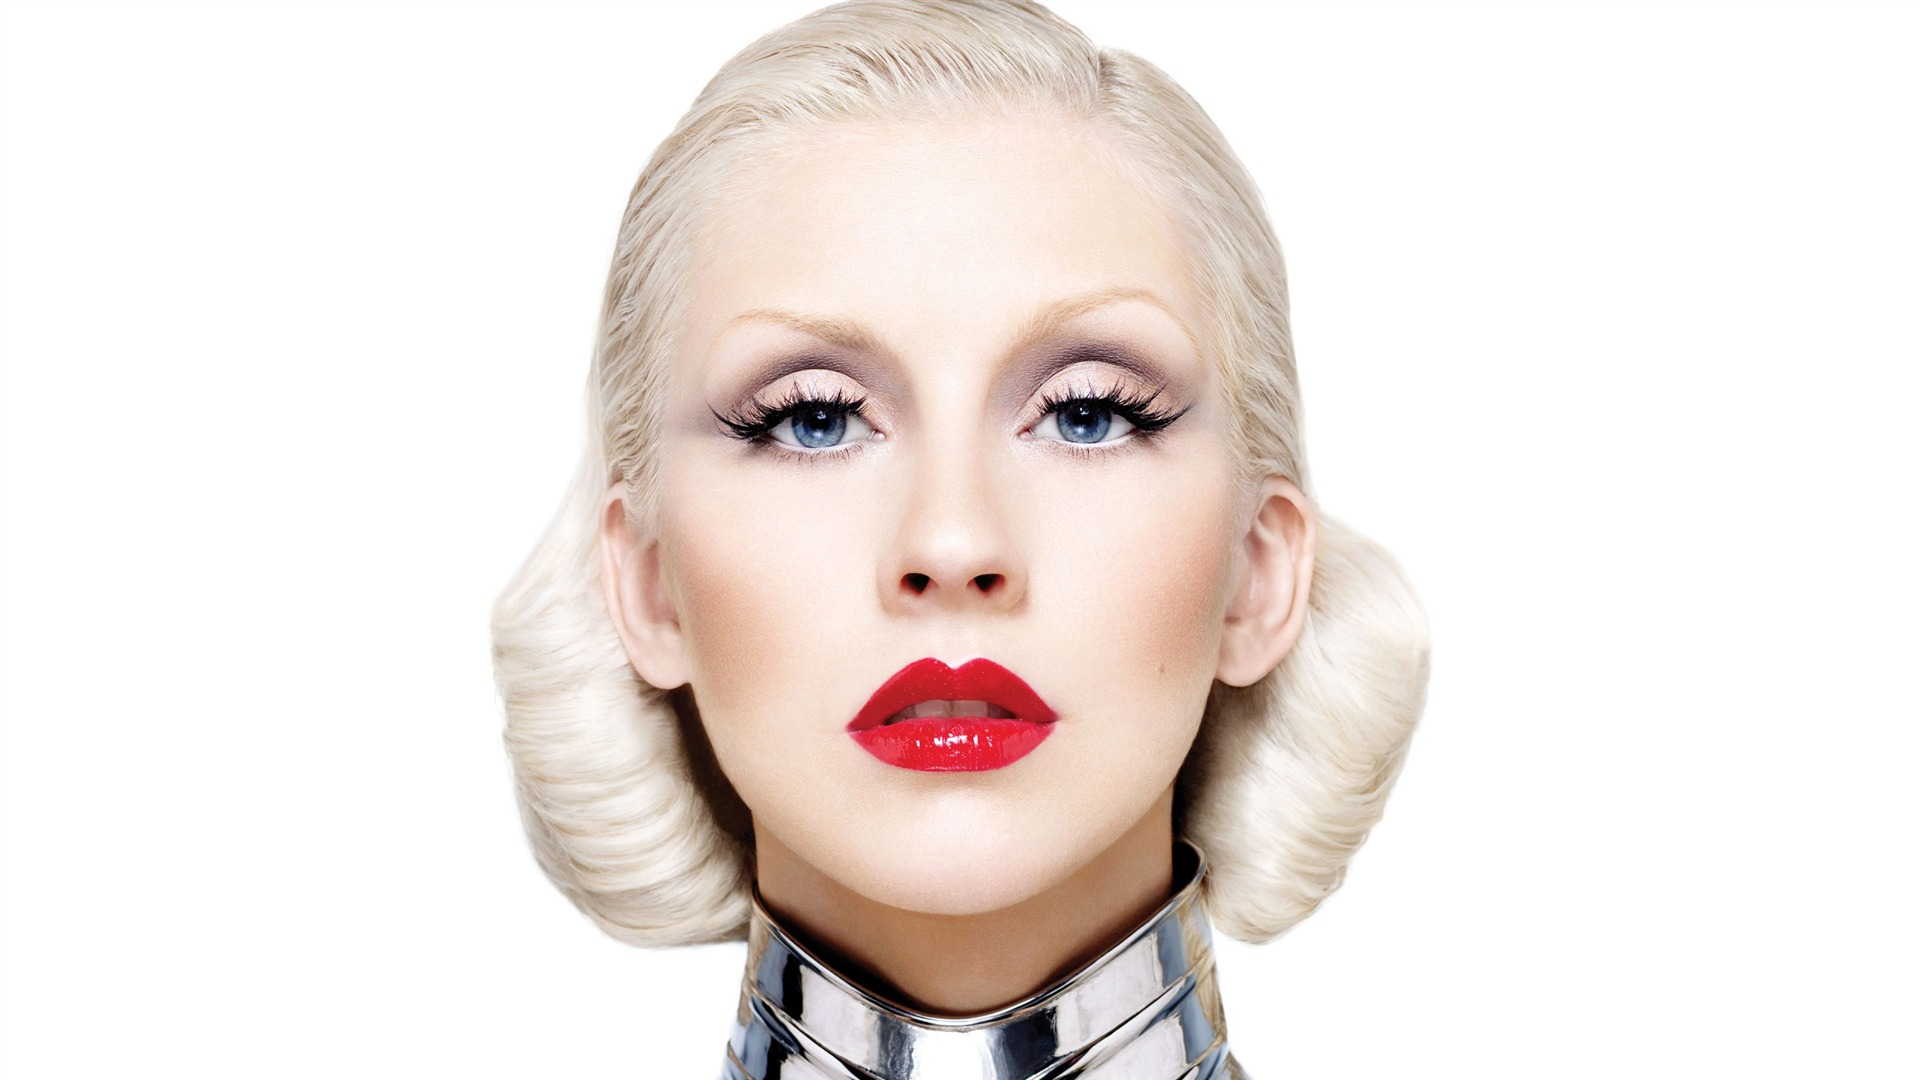 Candyman av Christina Aguilera